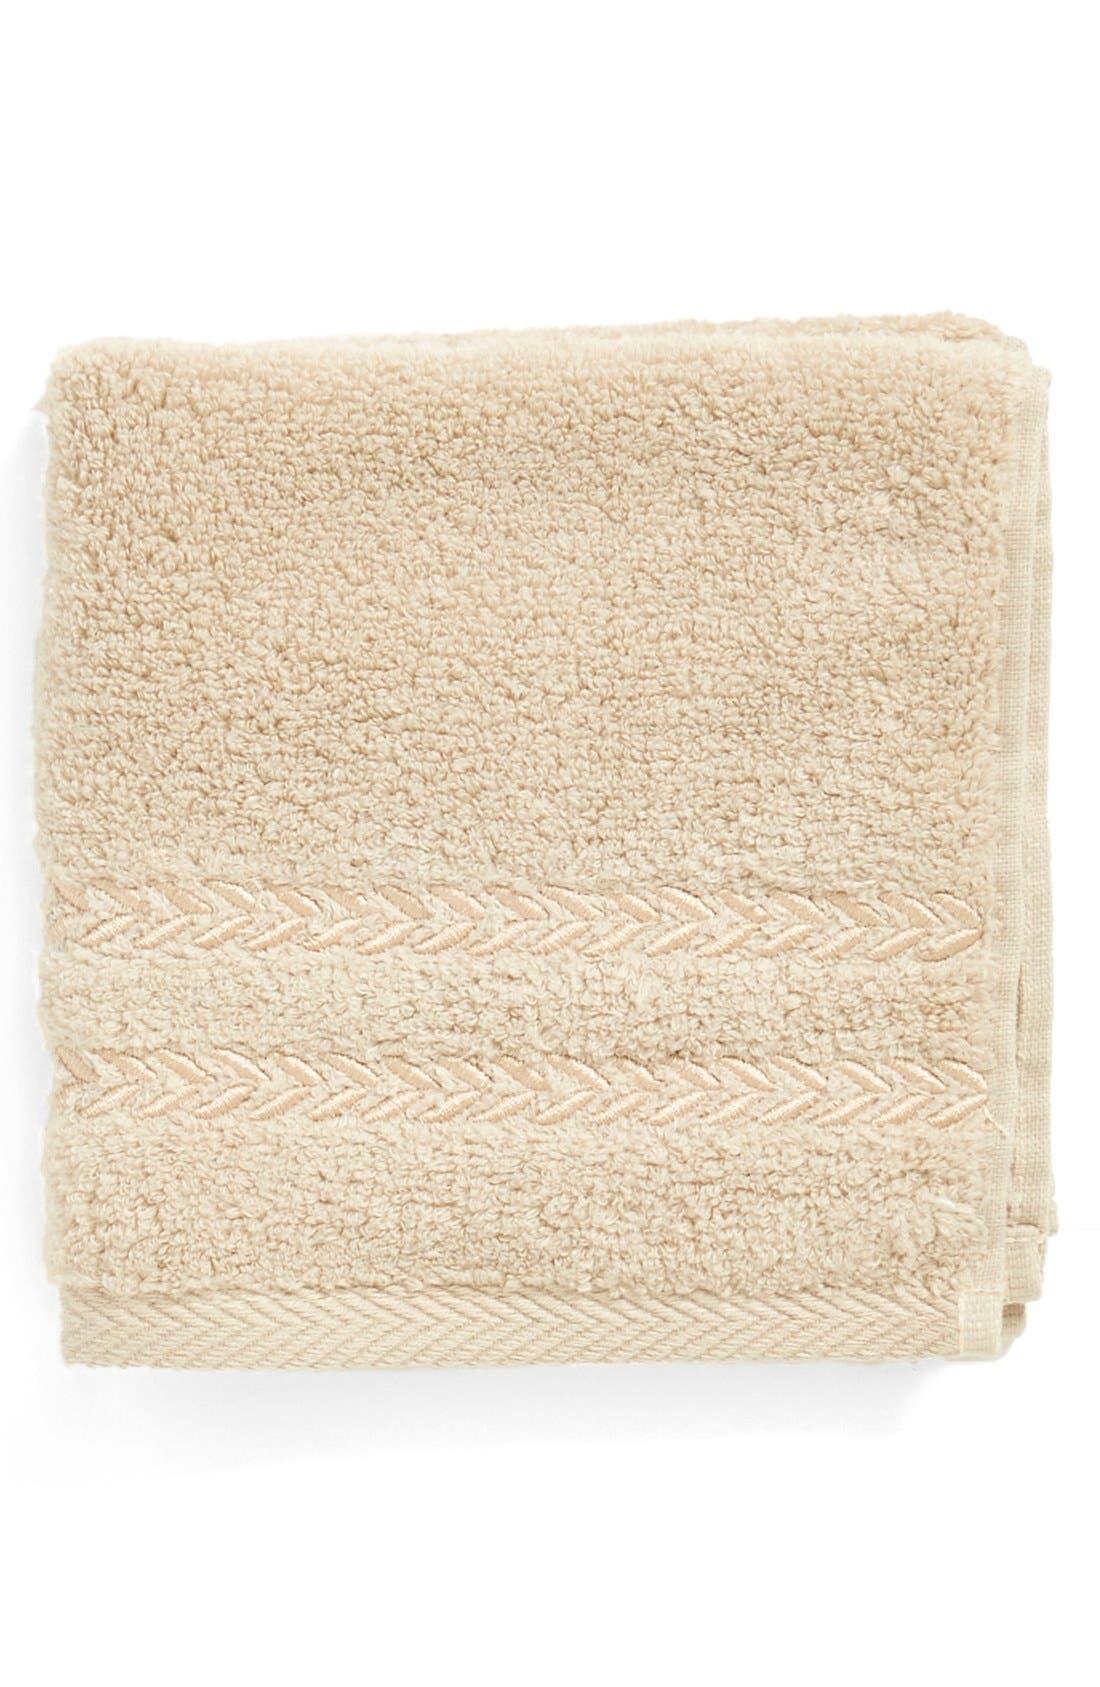 'Pearl Essence' Wash Towel,                             Main thumbnail 6, color,